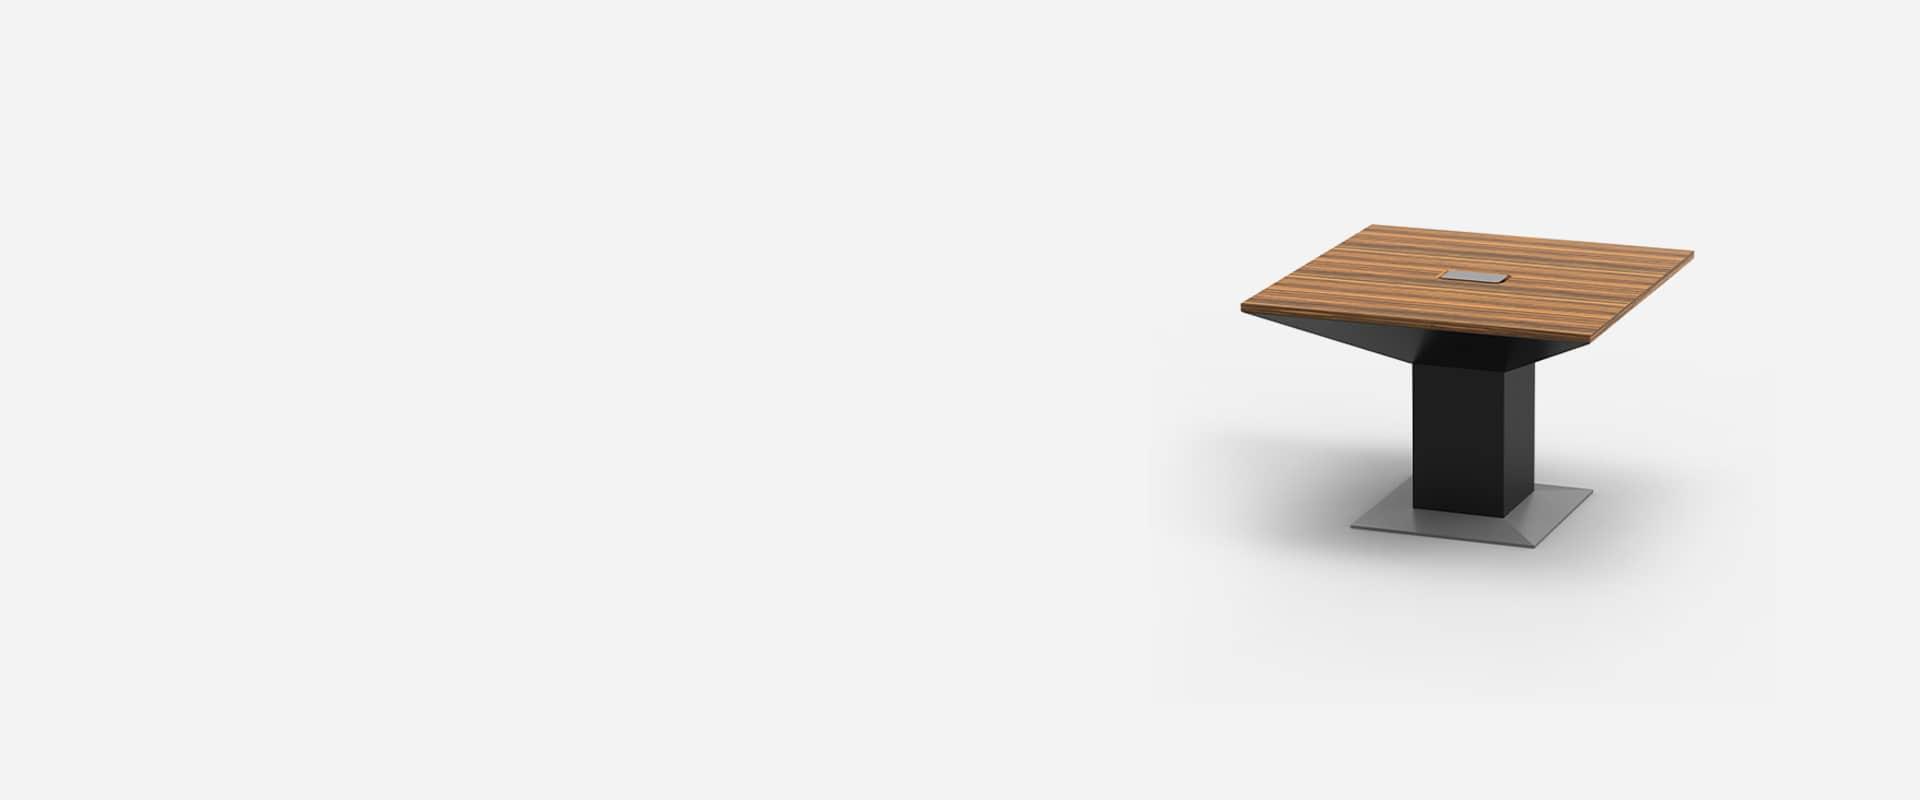 Status Meeting Tables